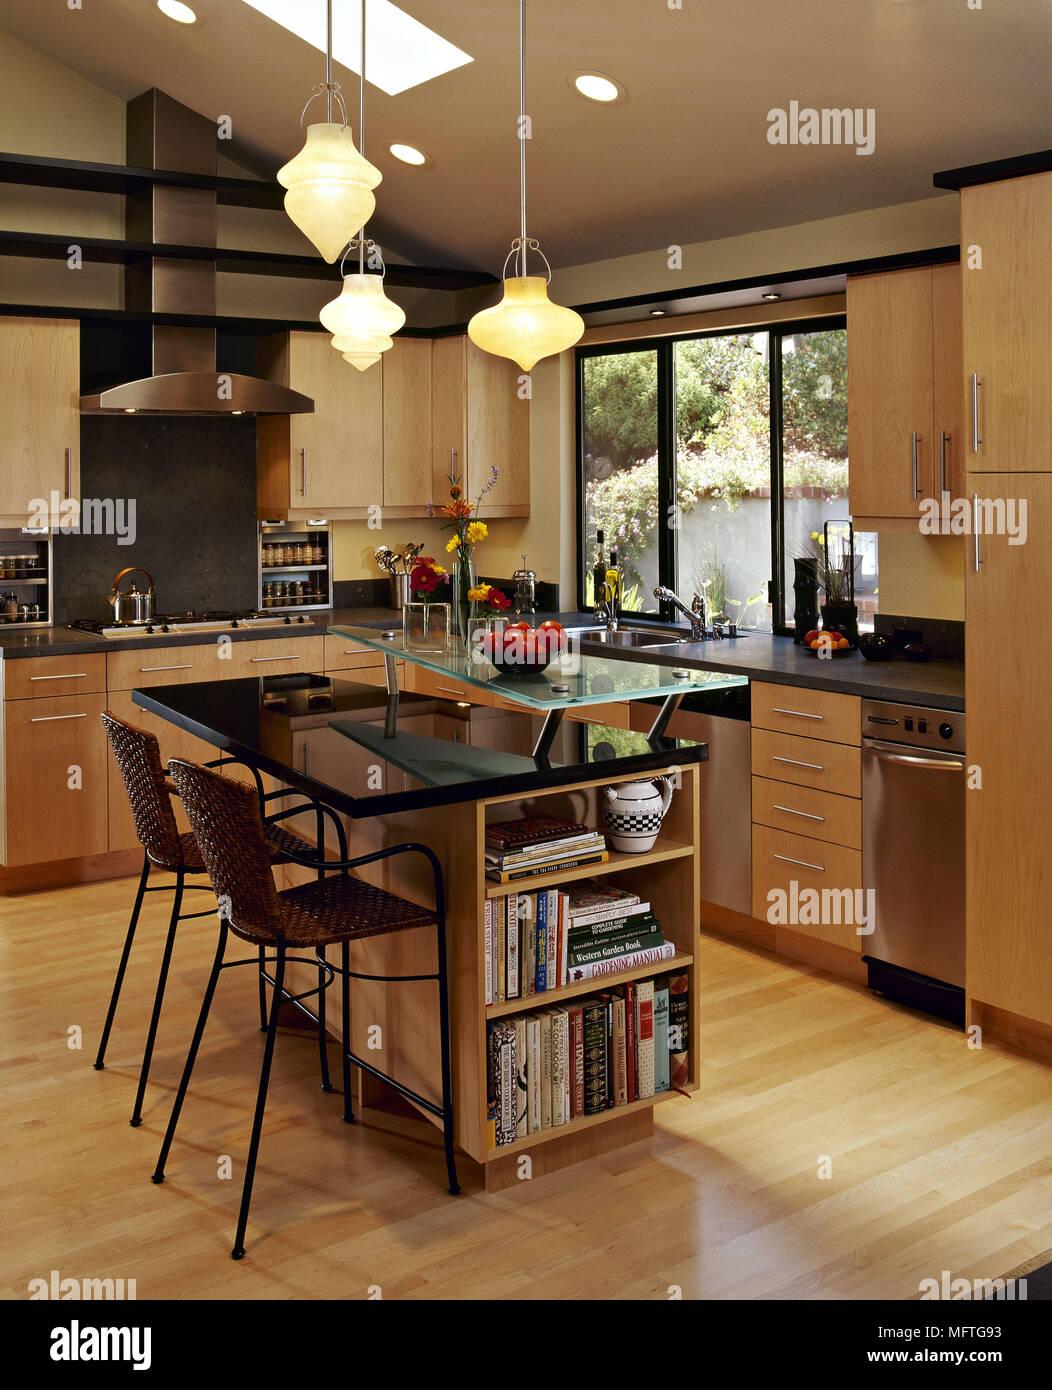 Arbeitsplatte kuche granit oder holz for Granit arbeitsplatte kuche